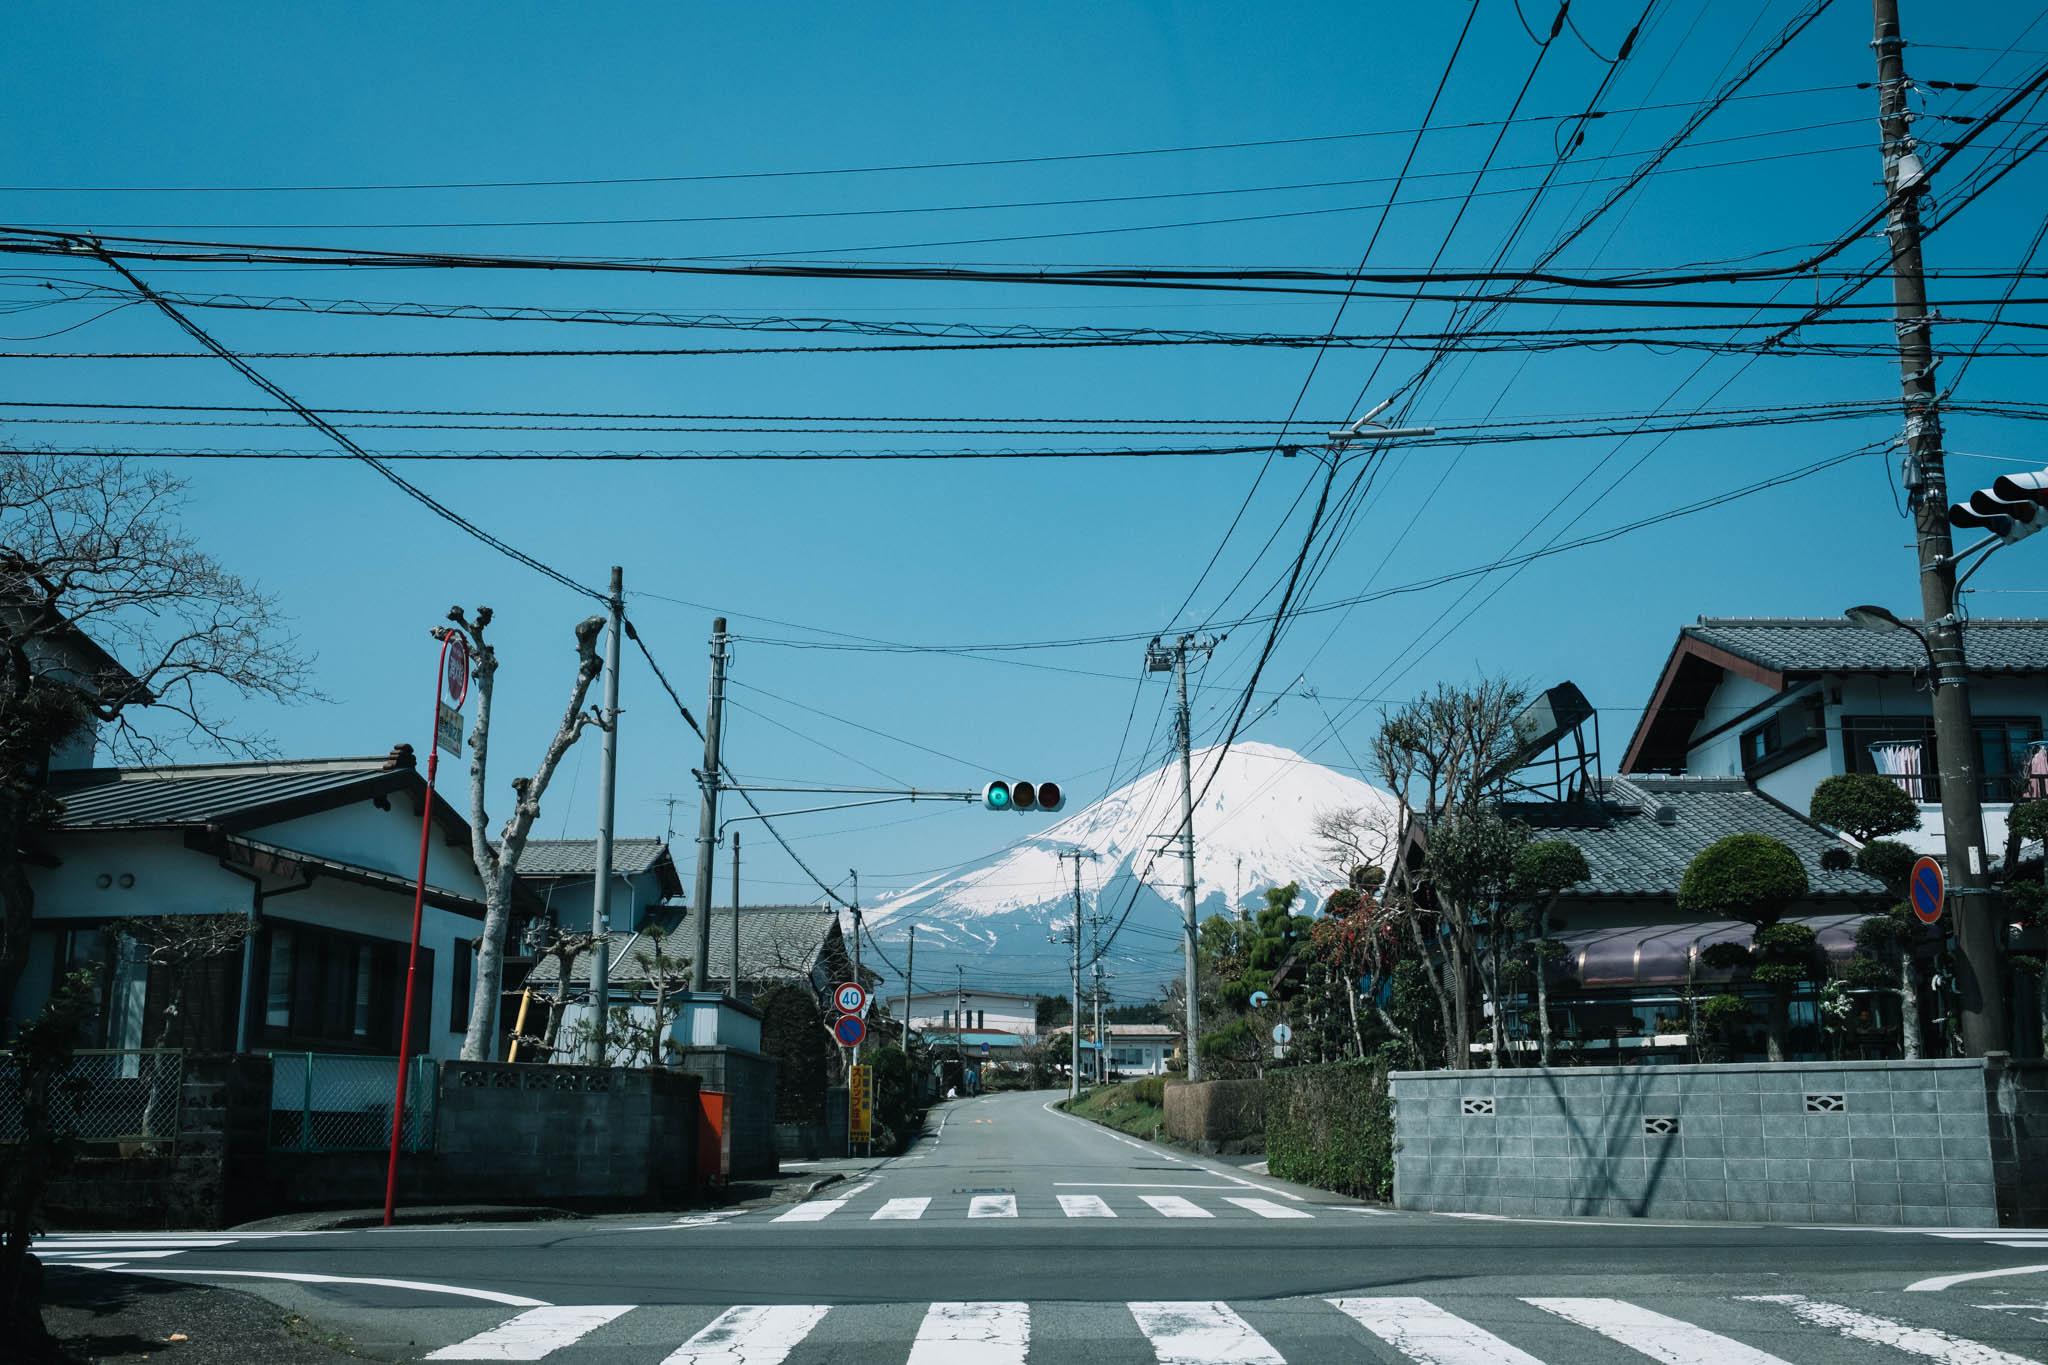 chris_eberhardt_japan_travel_reise_nippon-70.jpg